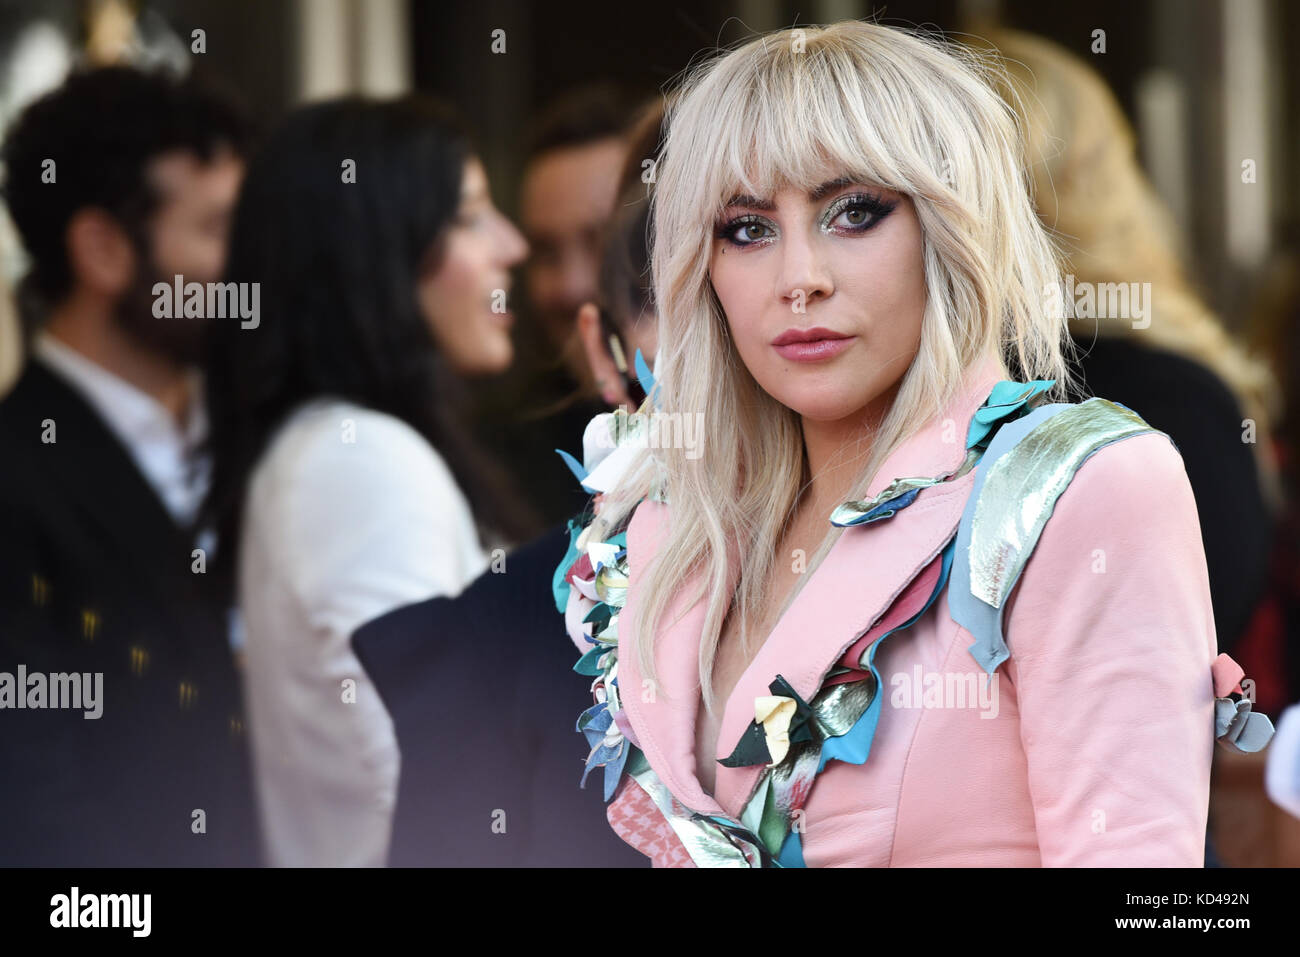 42nd Toronto International Film Festival - Lady Gaga Photocall  Featuring: Lady Gaga Where: Toronto, Canada When: - Stock Image